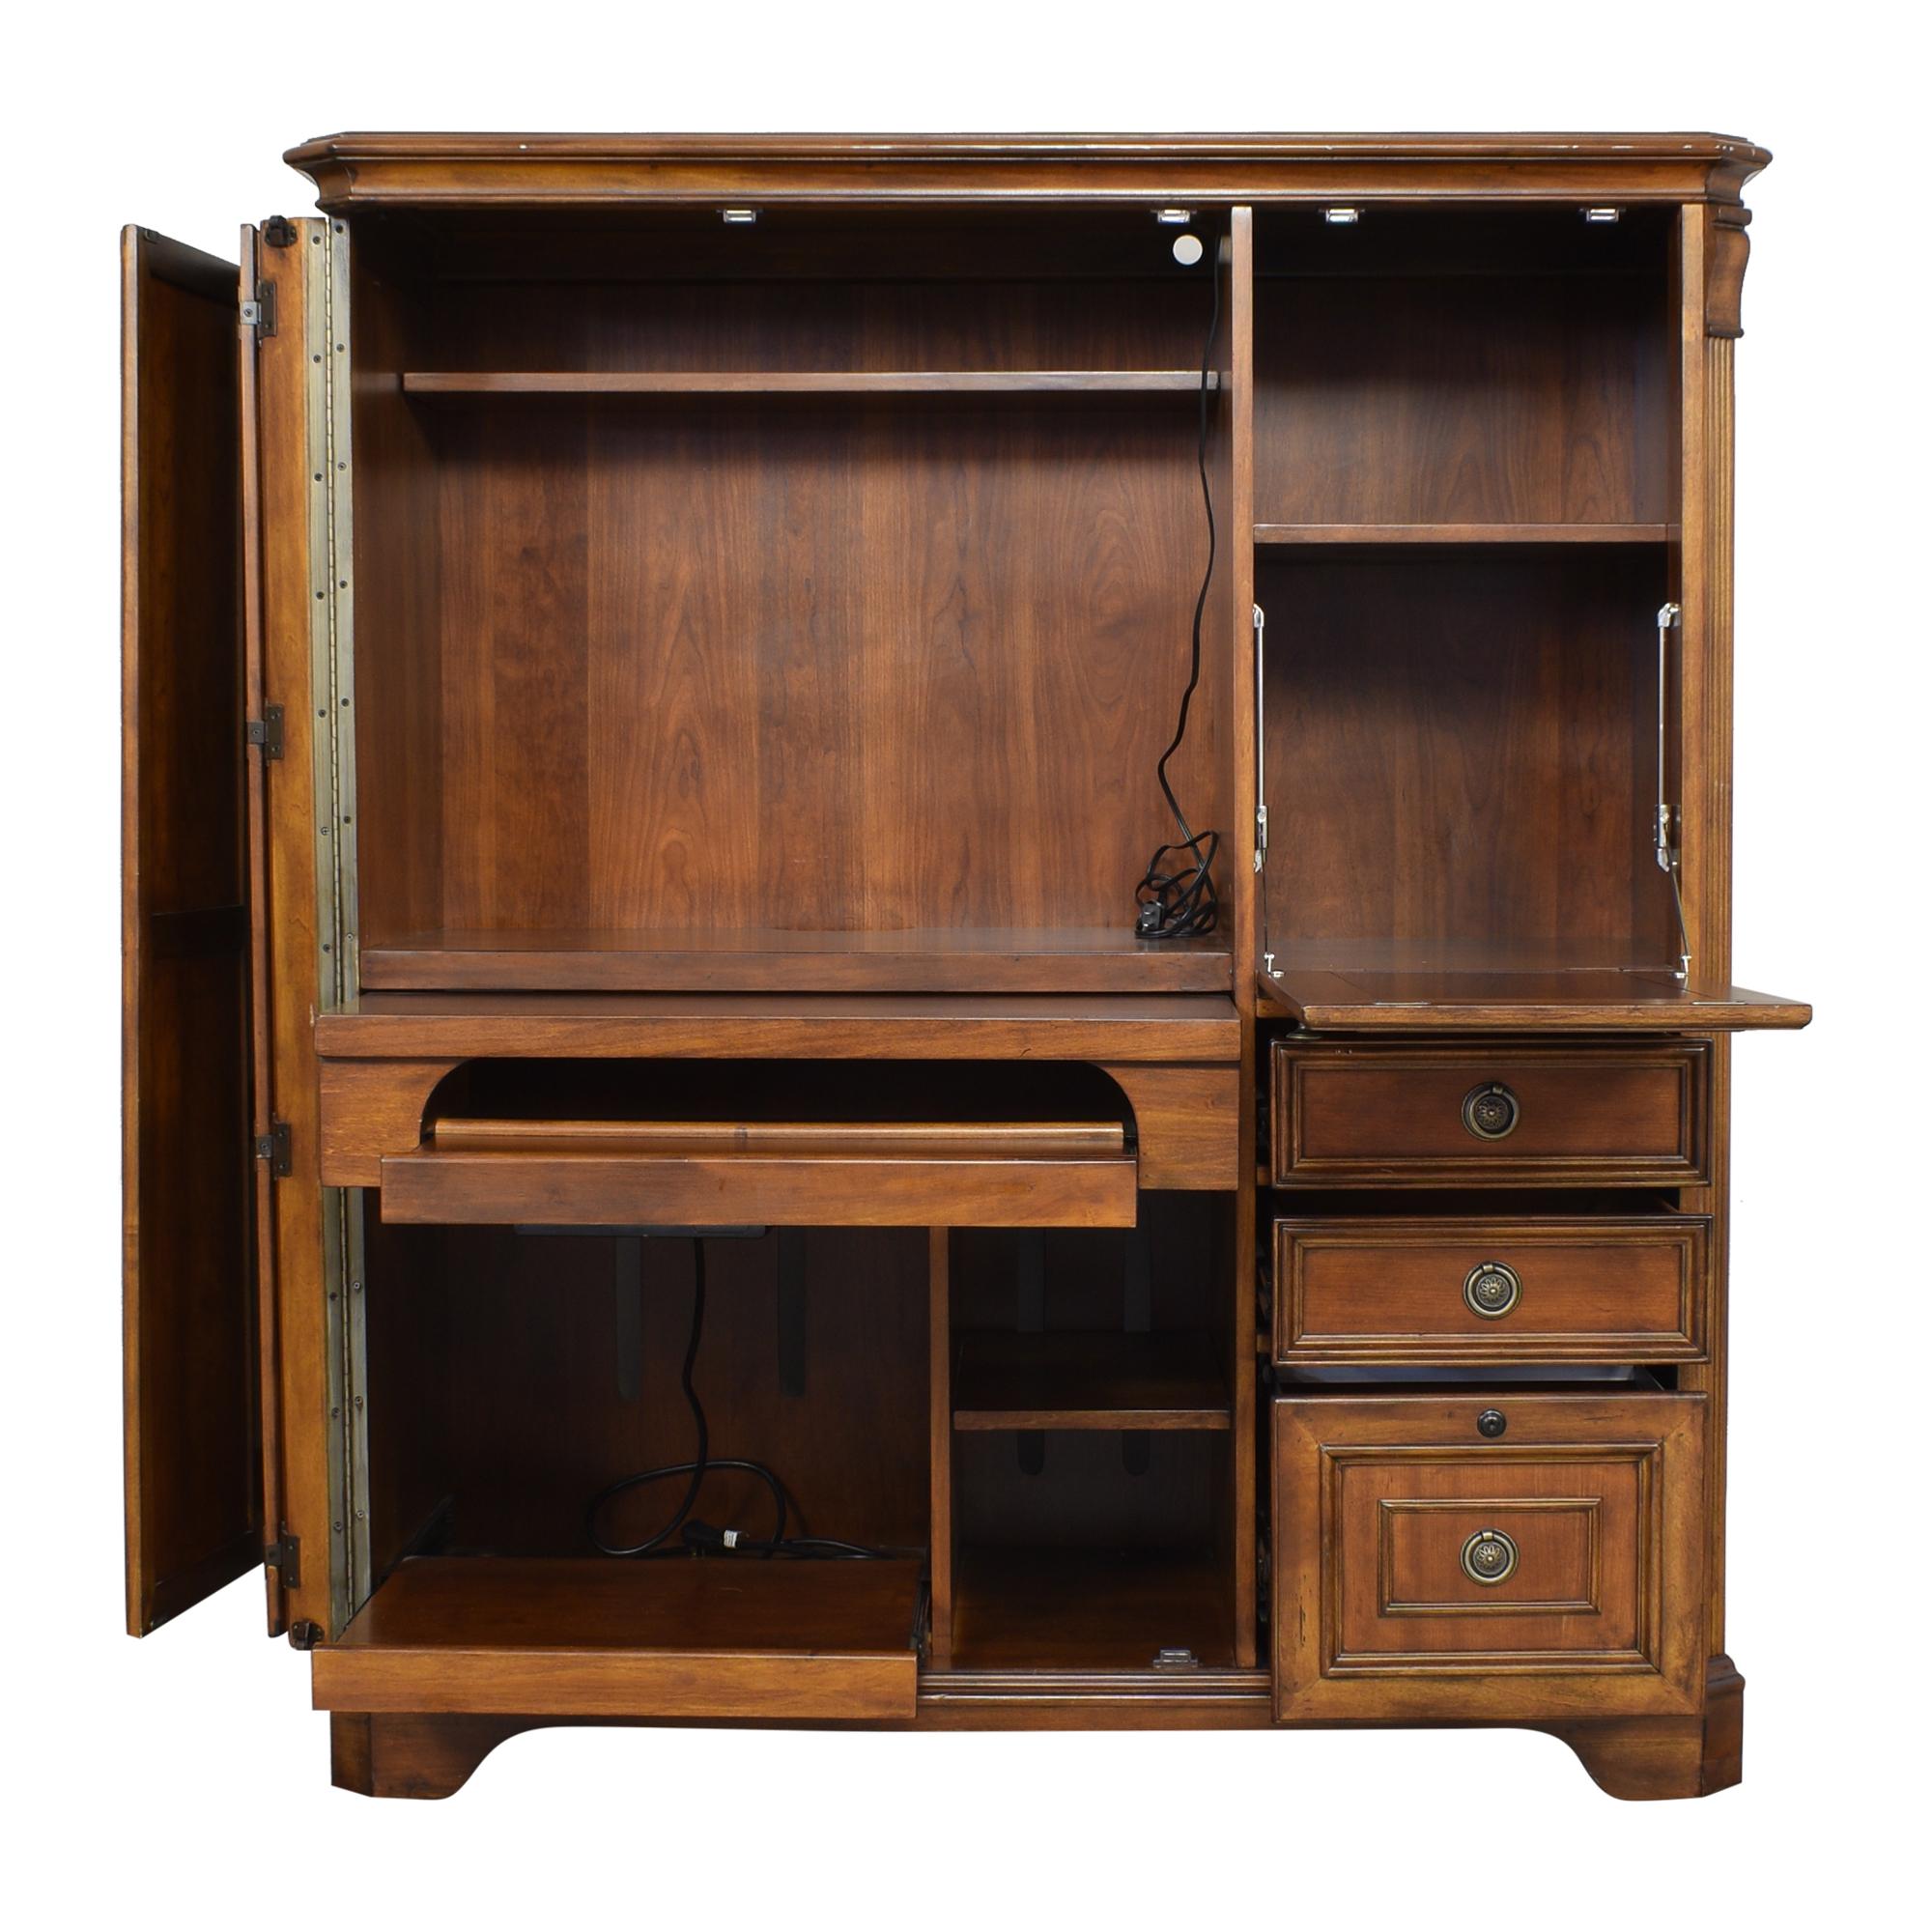 Hooker Furniture Hooker Furniture Office Armoire brown